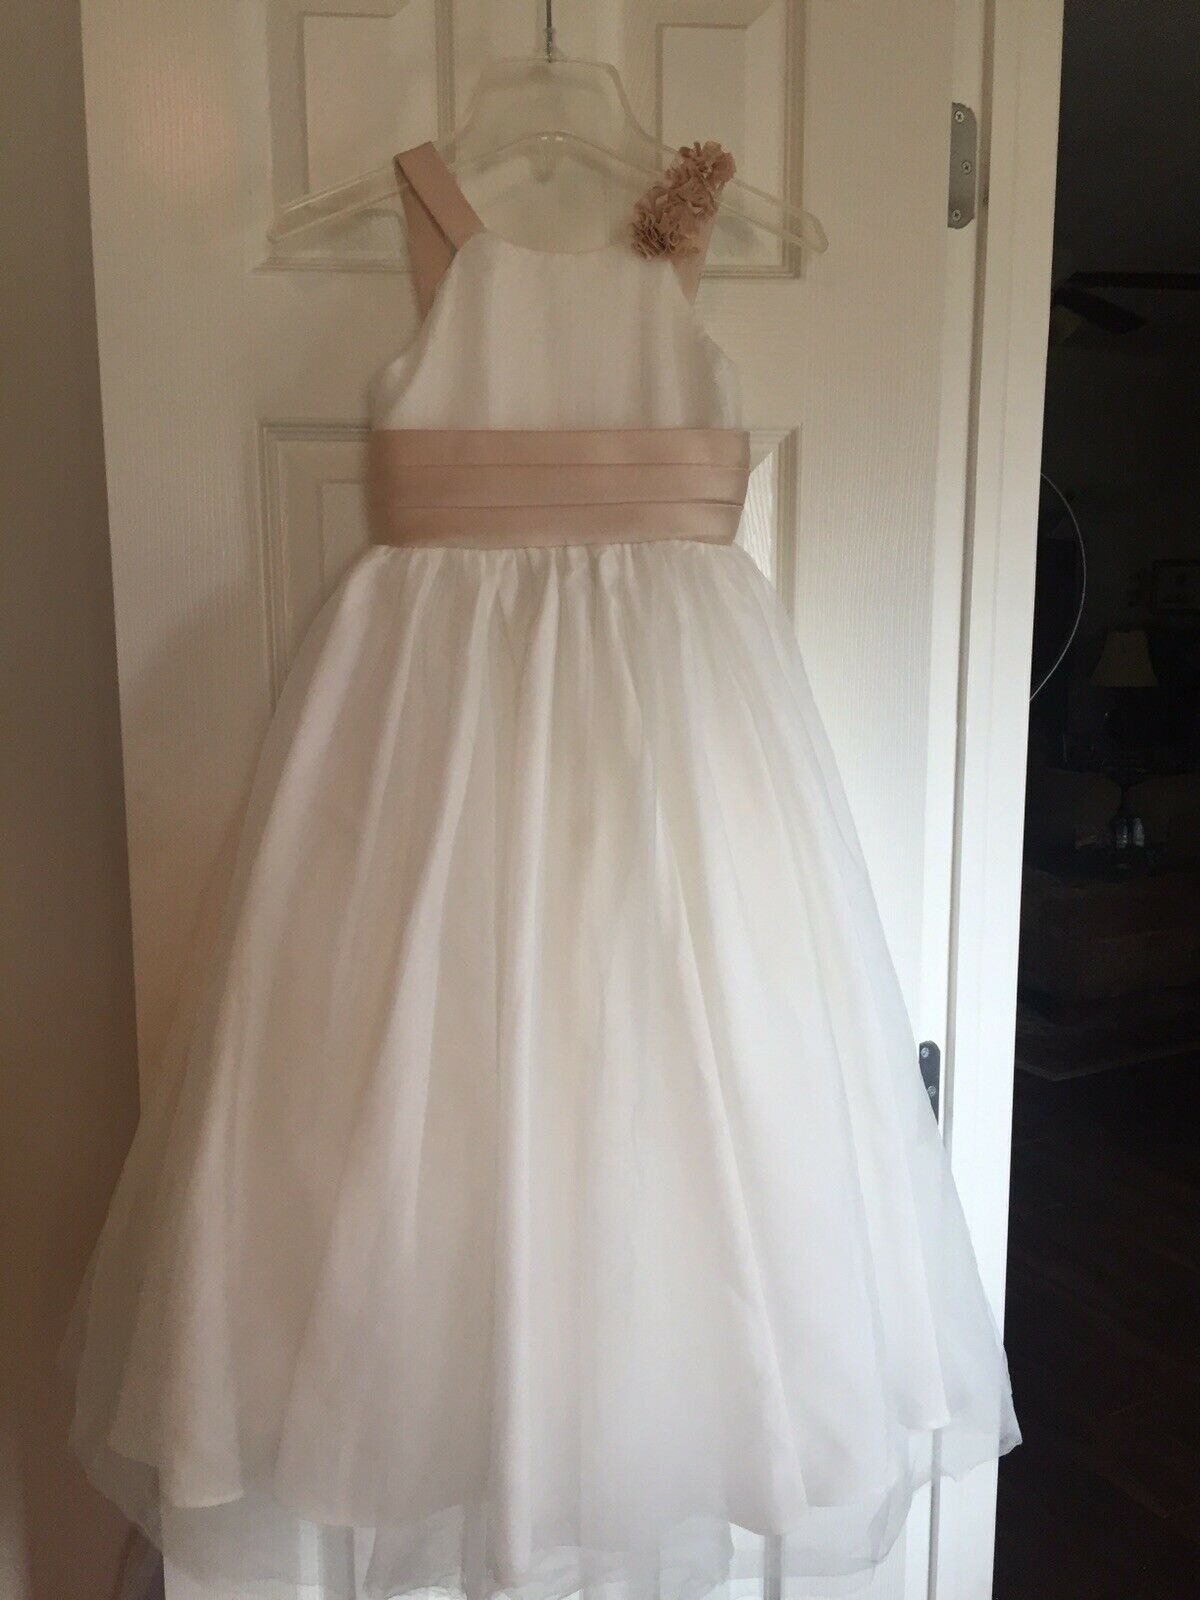 Girls Size 6 alfred angelo Flower Girl Dress Ivory/champagne